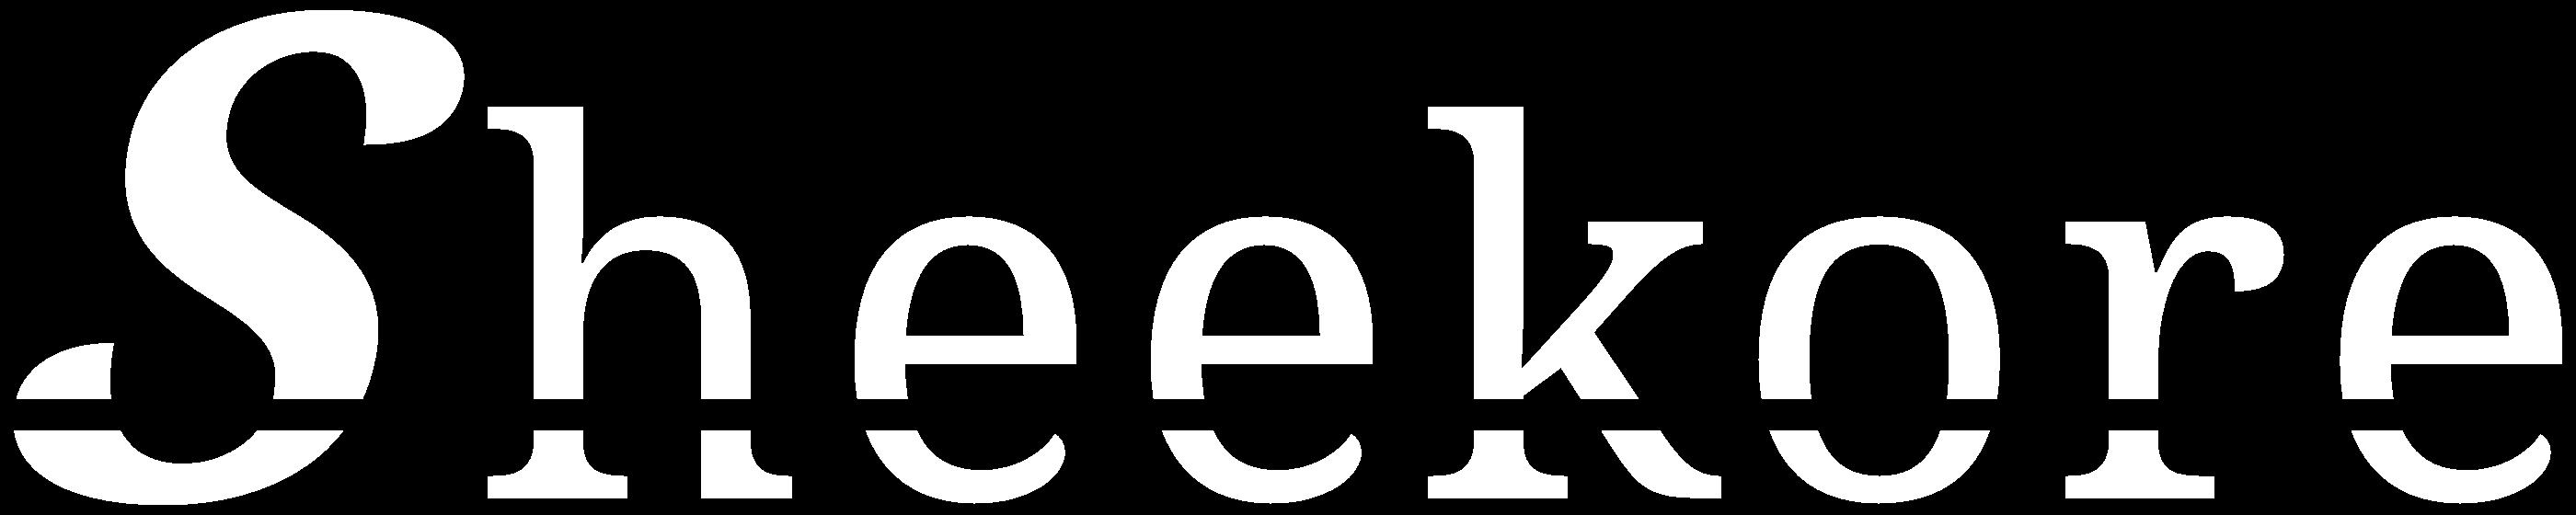 Sheekore monochrome white logo.